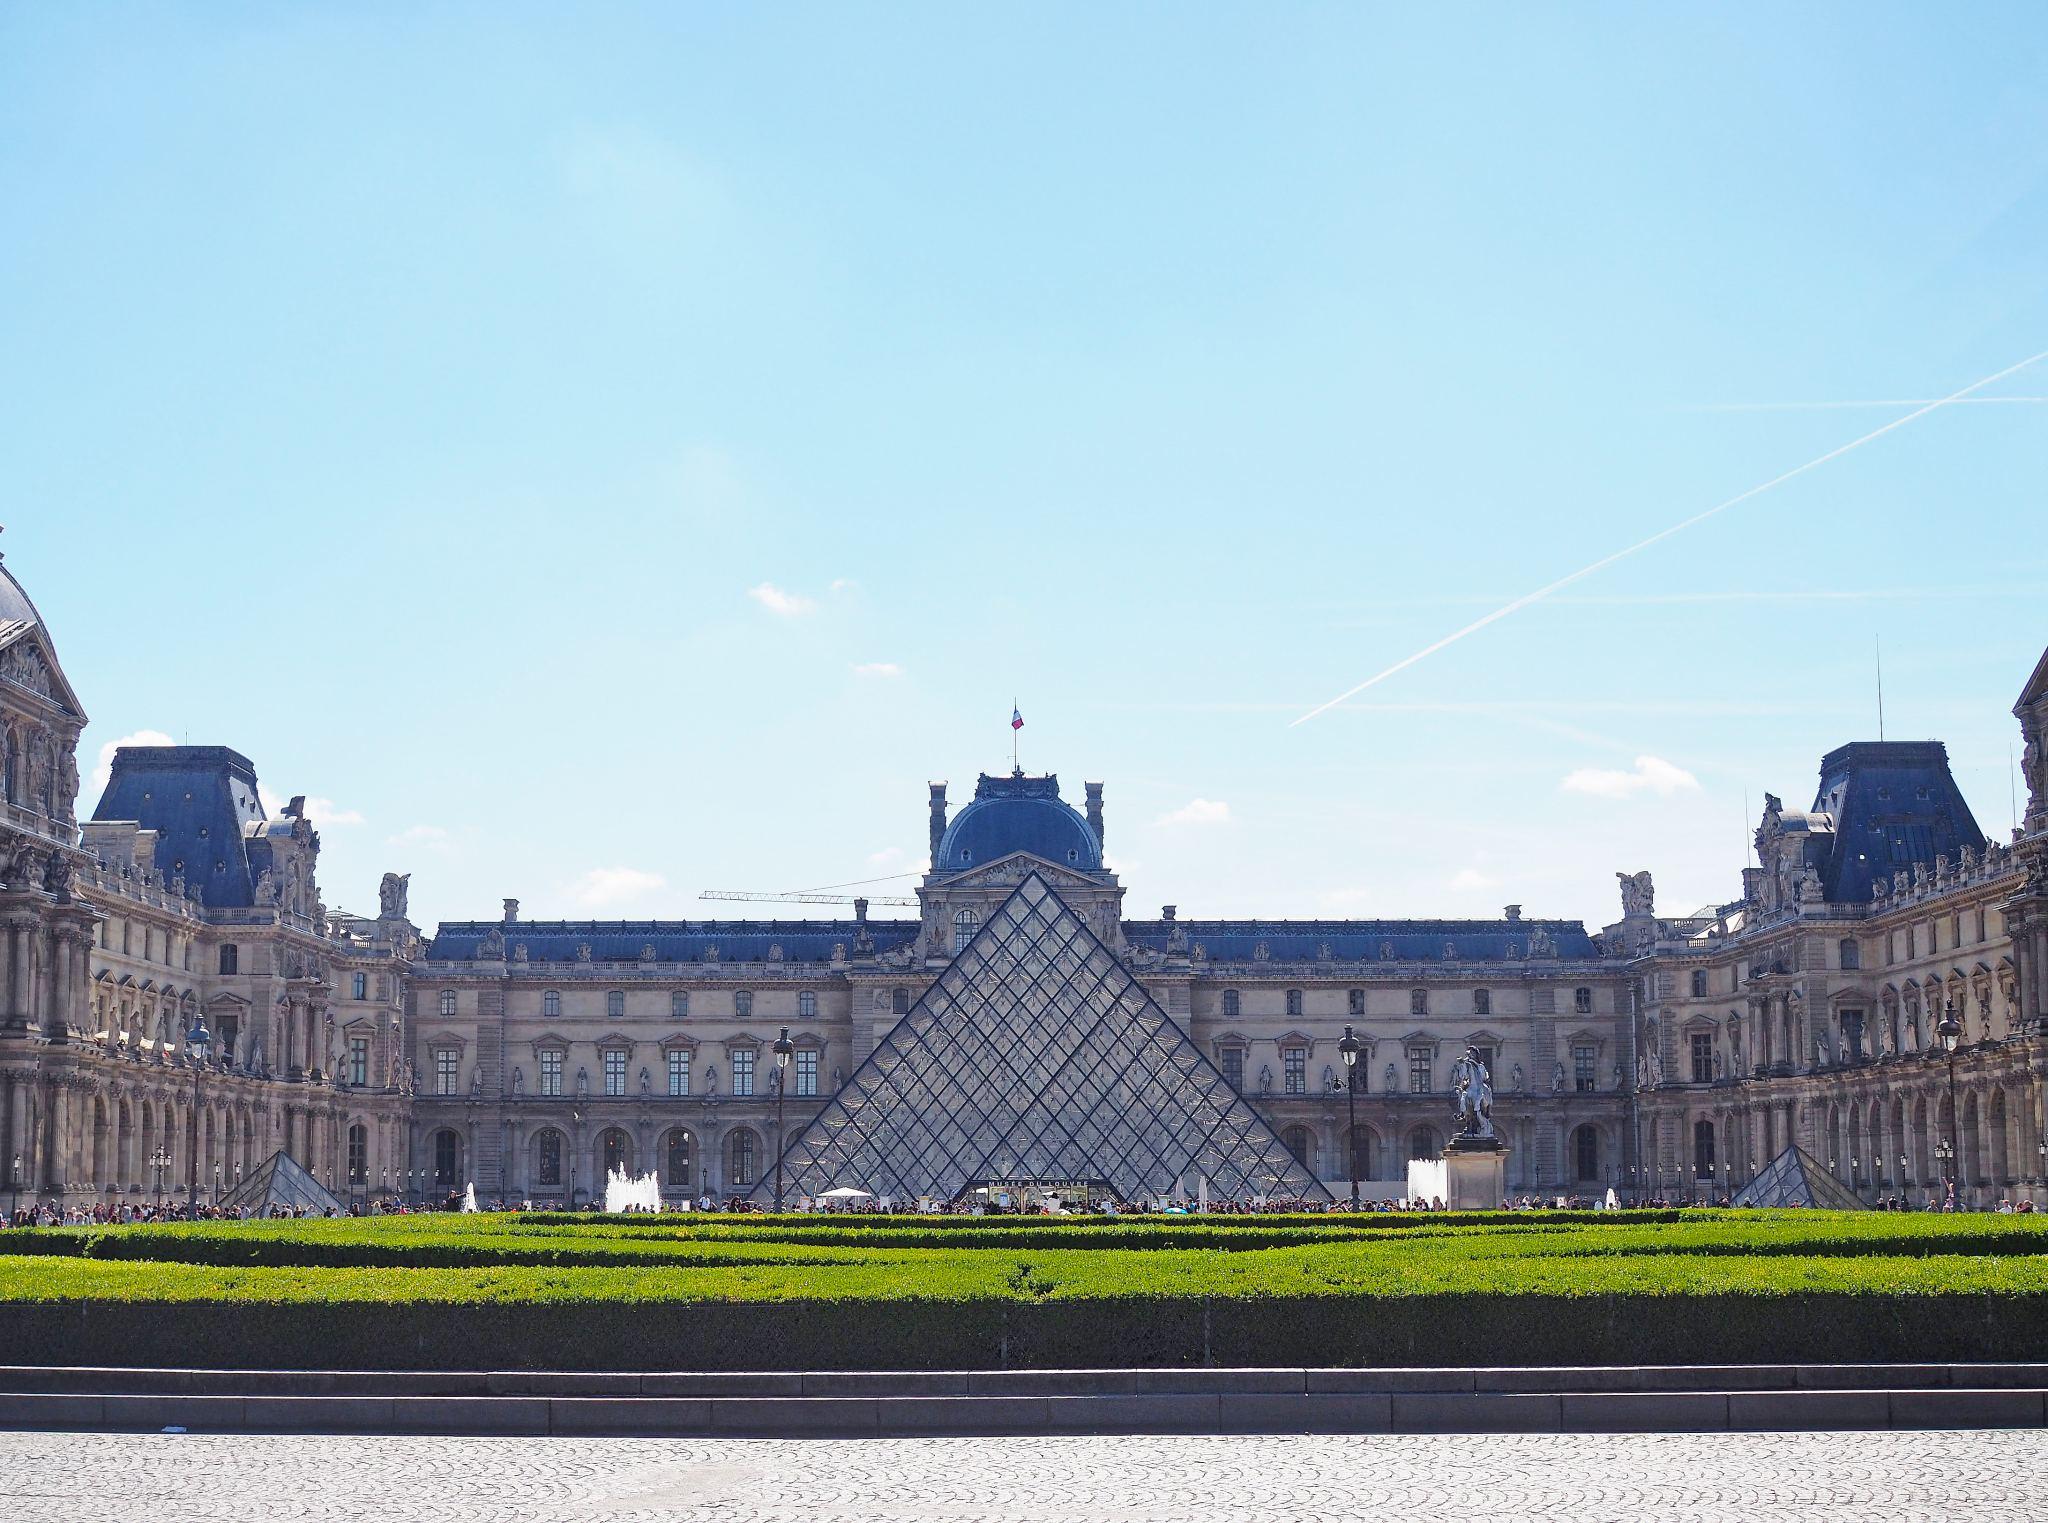 Capital of France, Paris